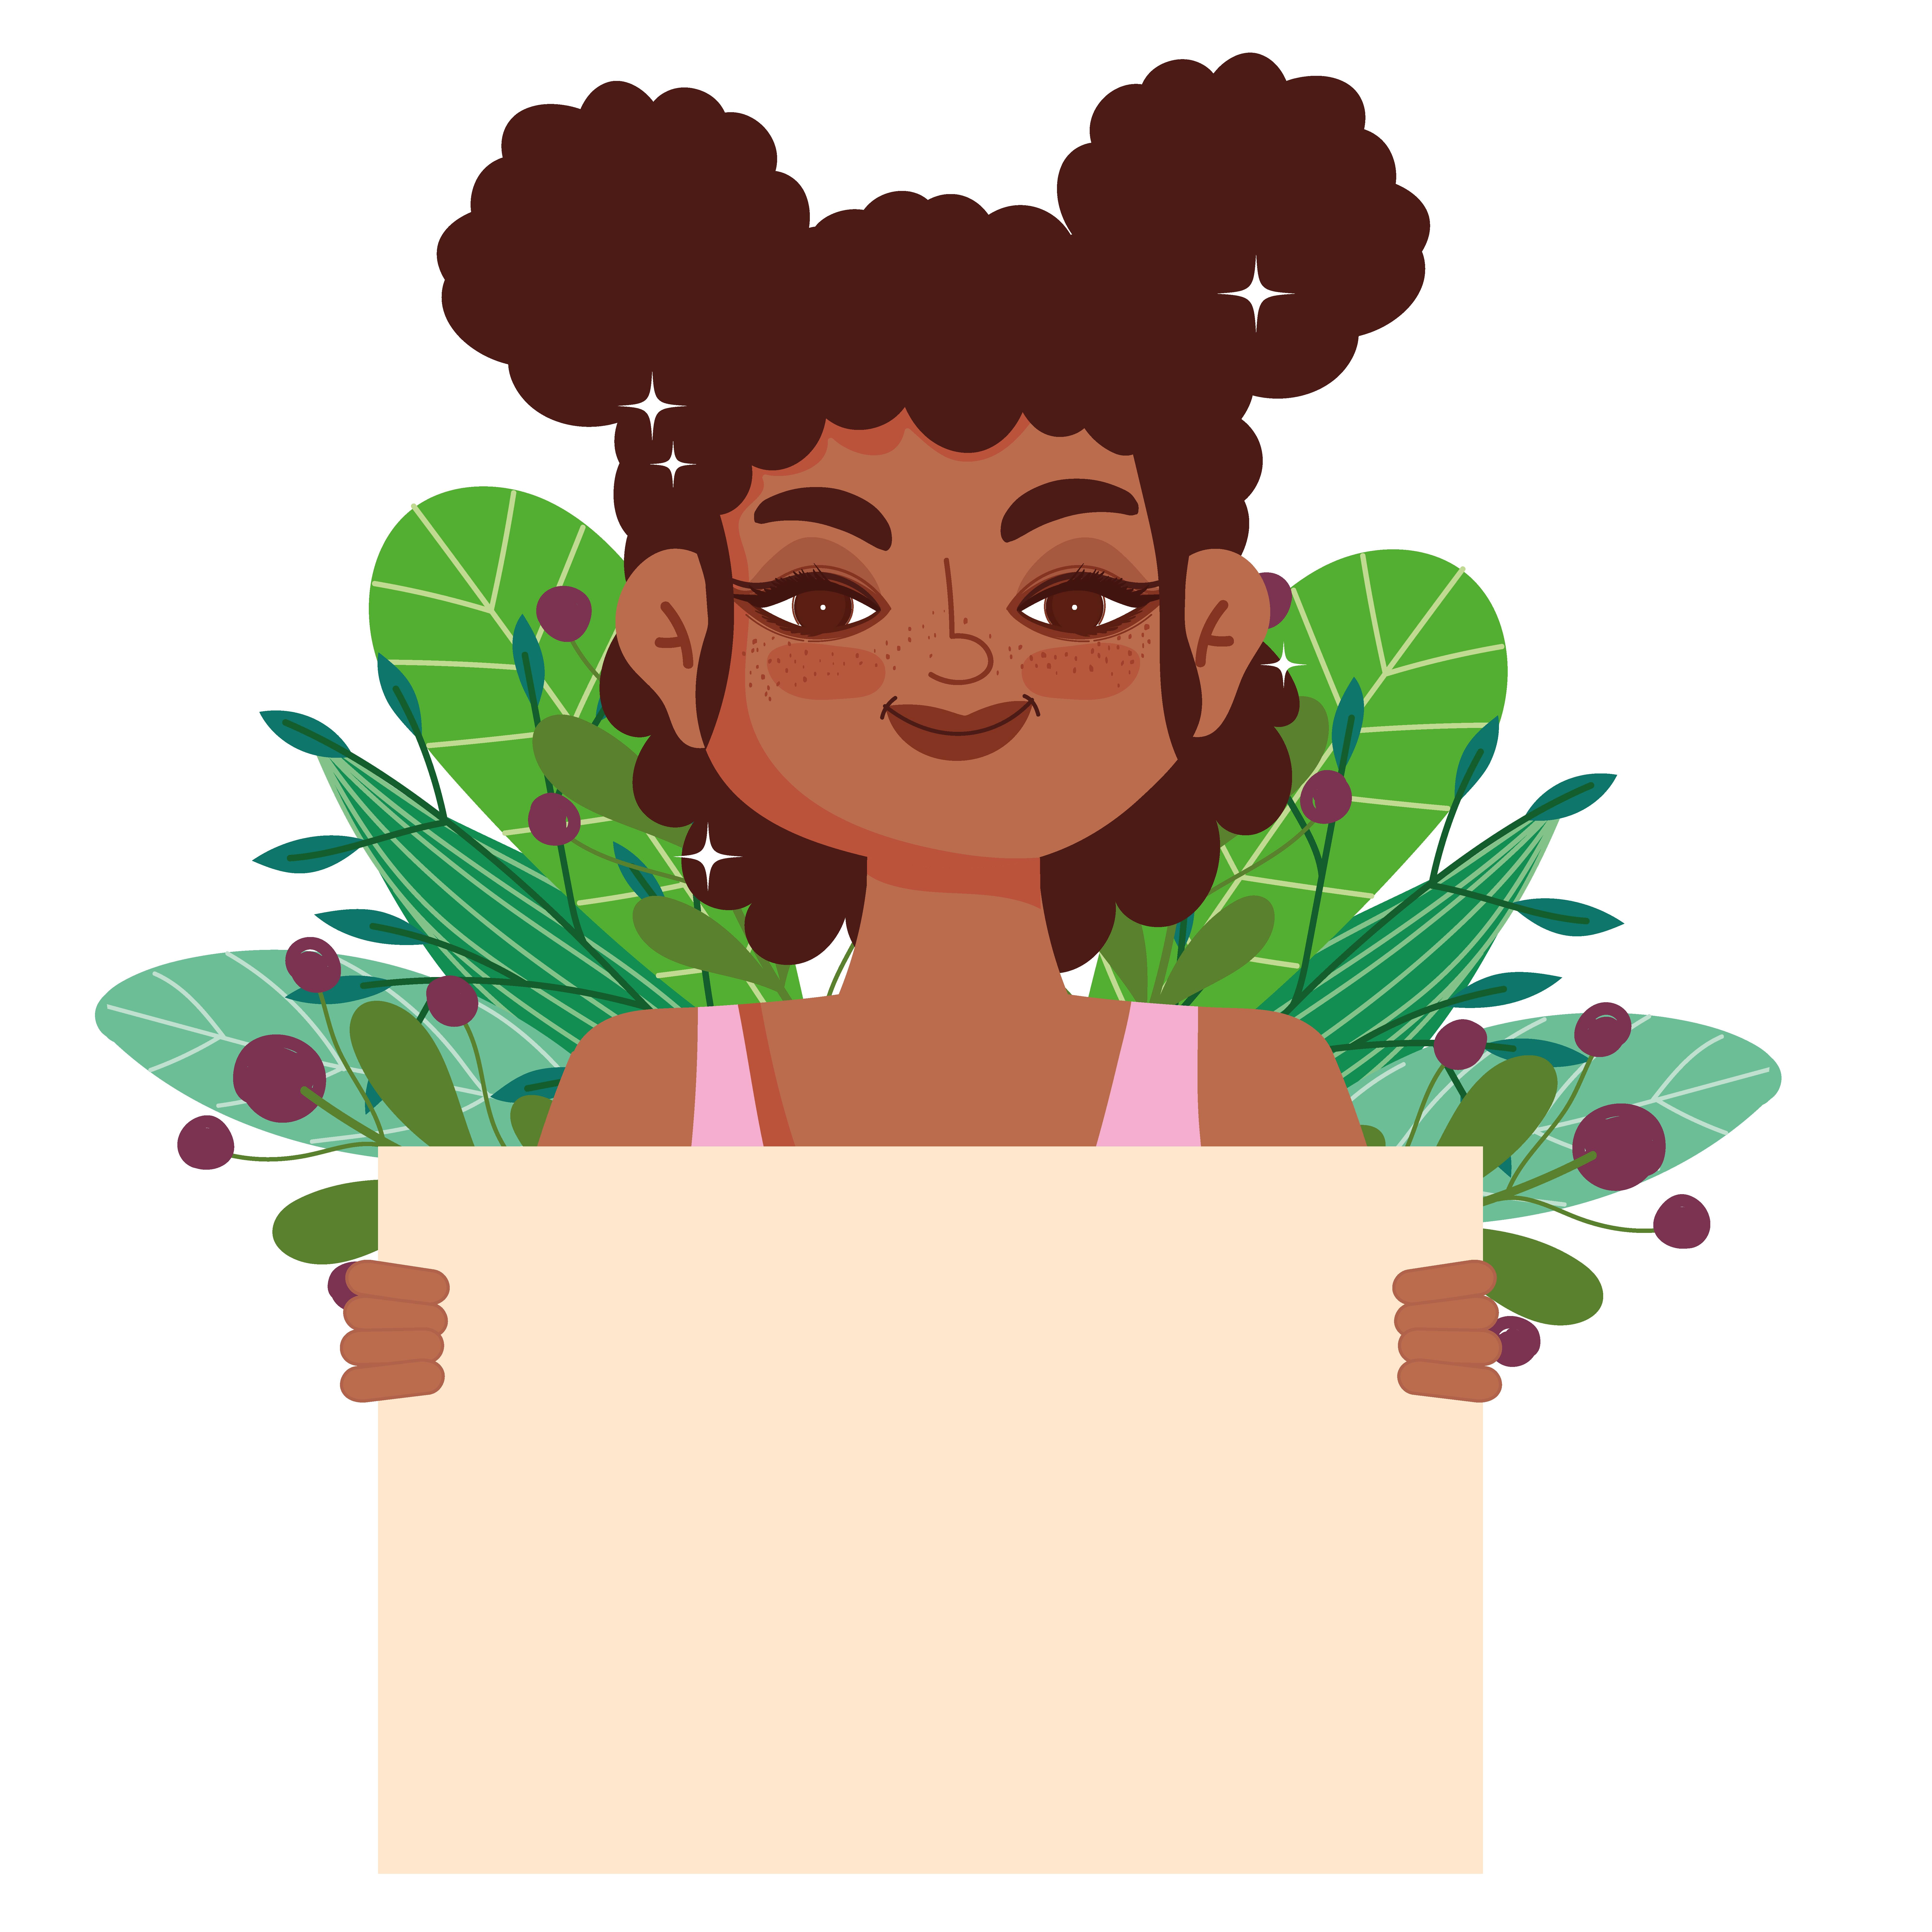 Cartoon afro girl with Cartoon 'The